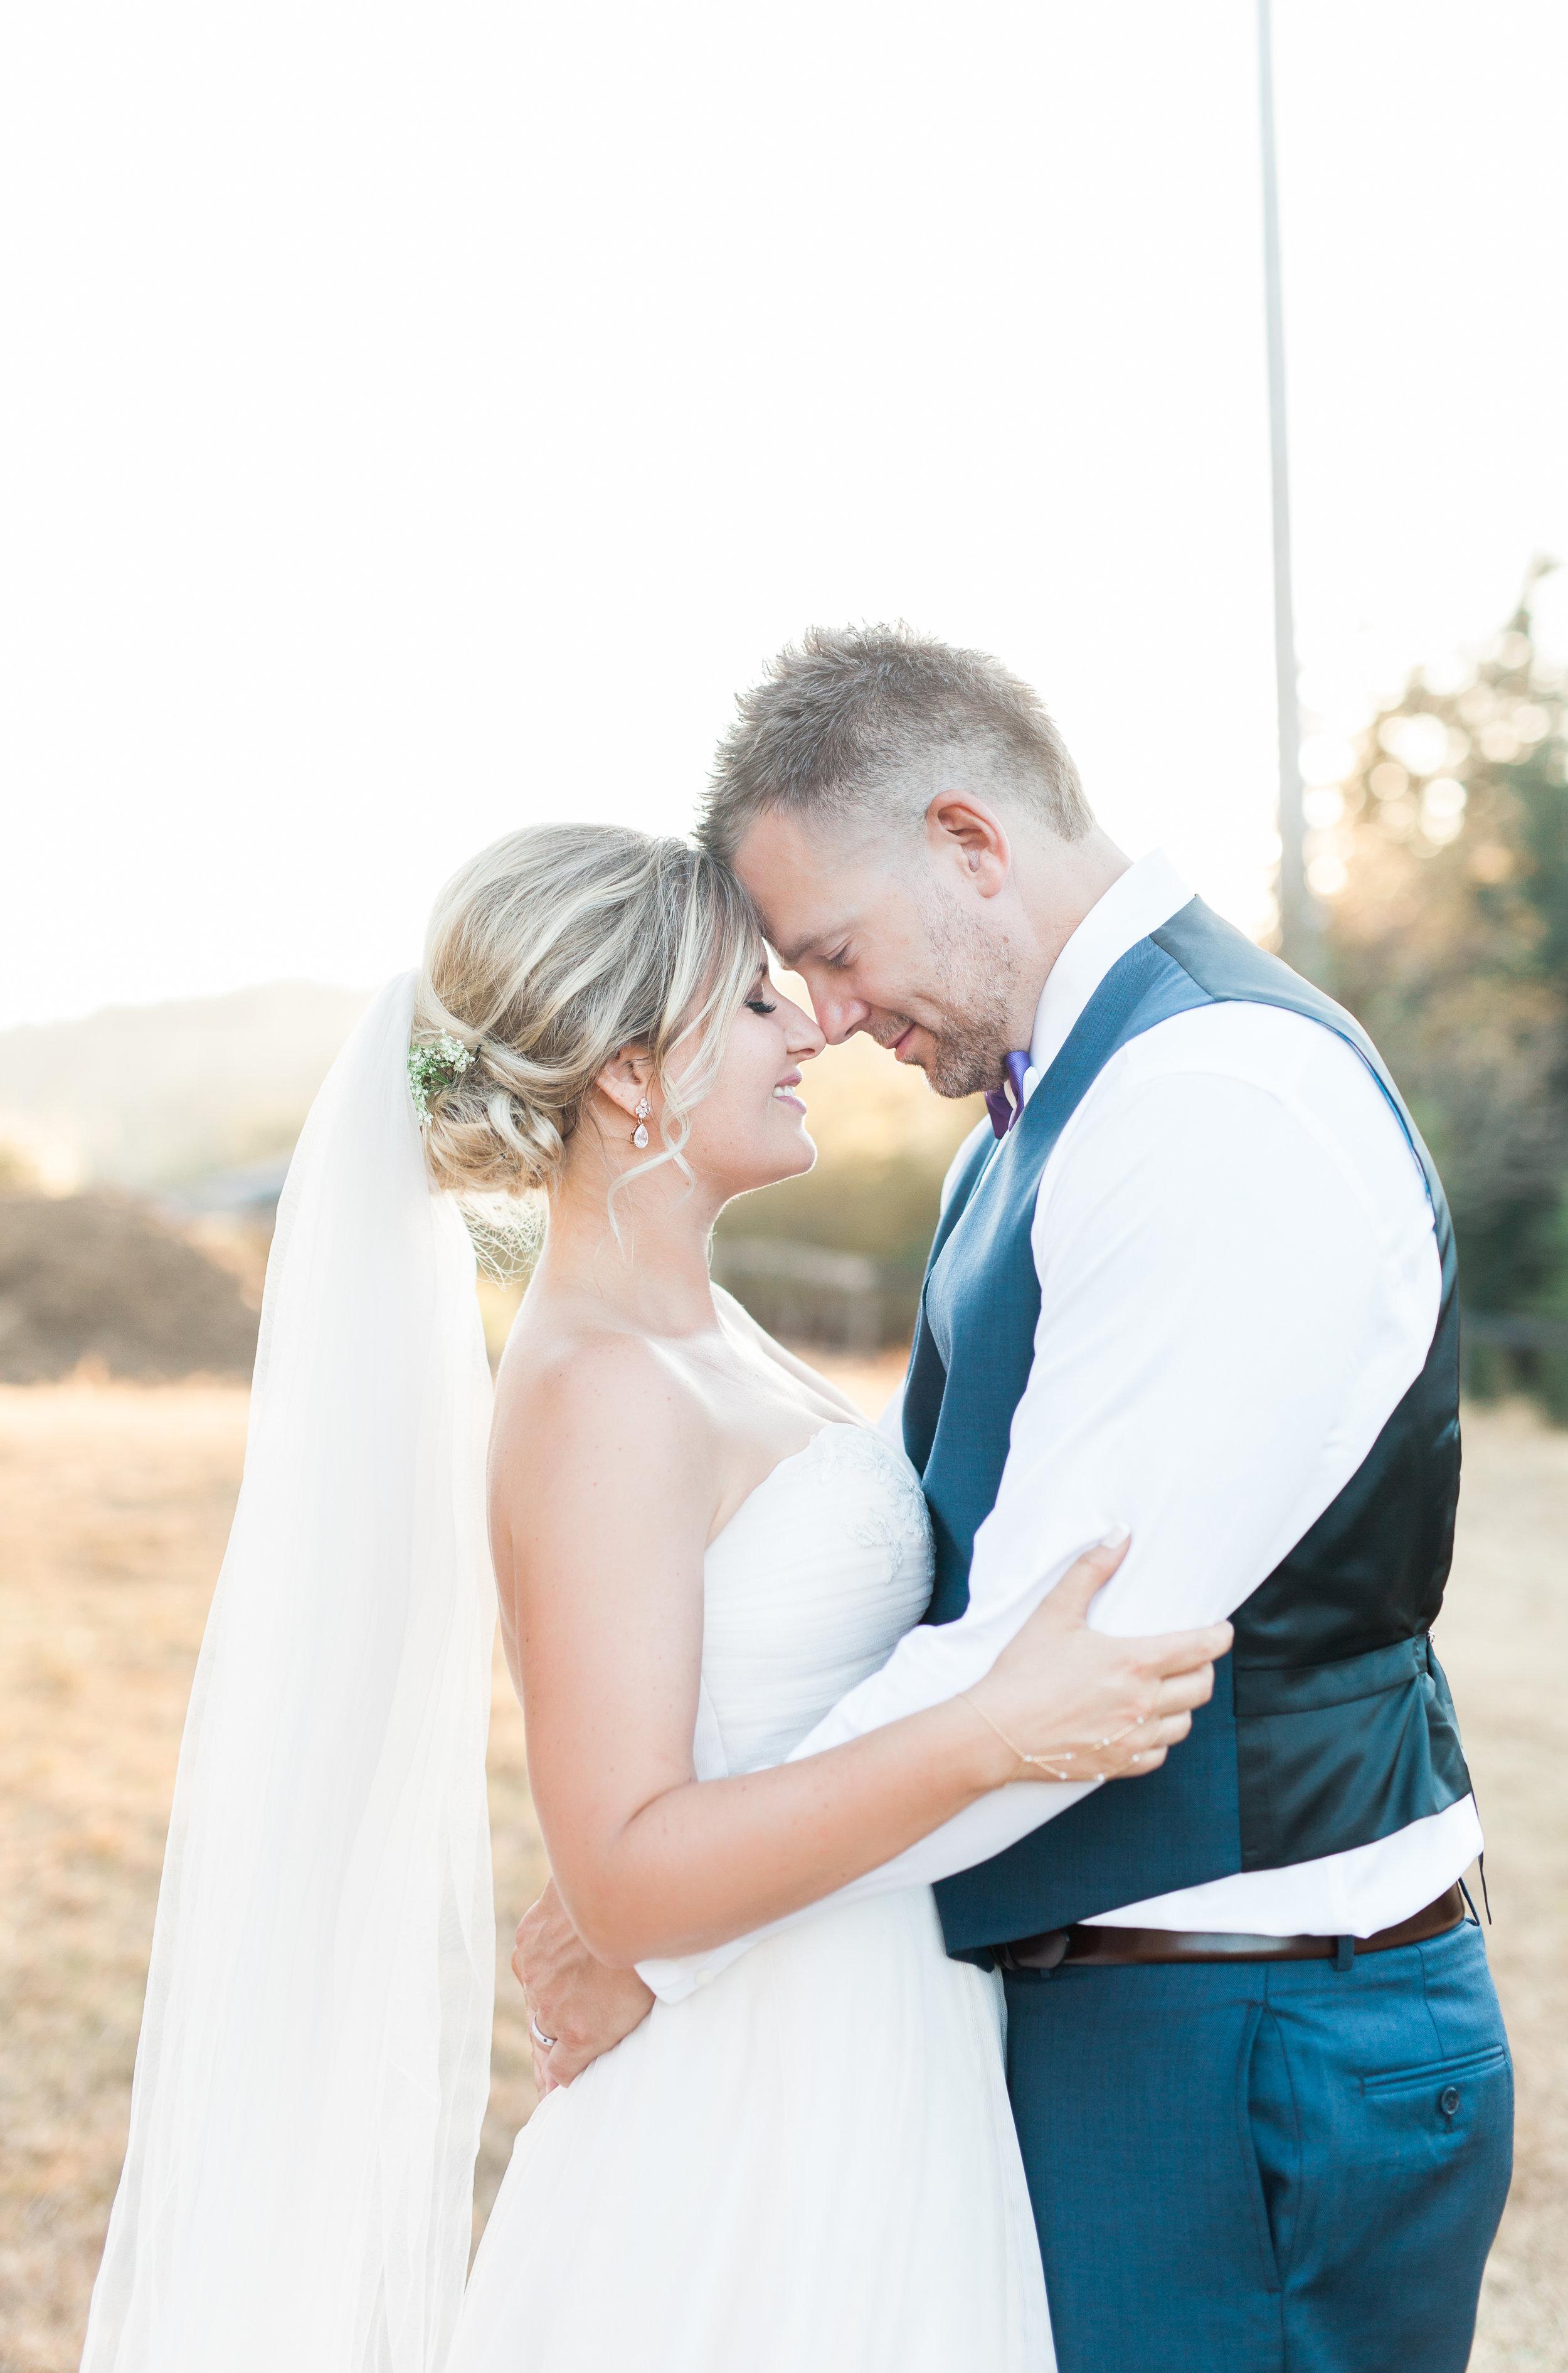 H & J | FARM WEDDING |